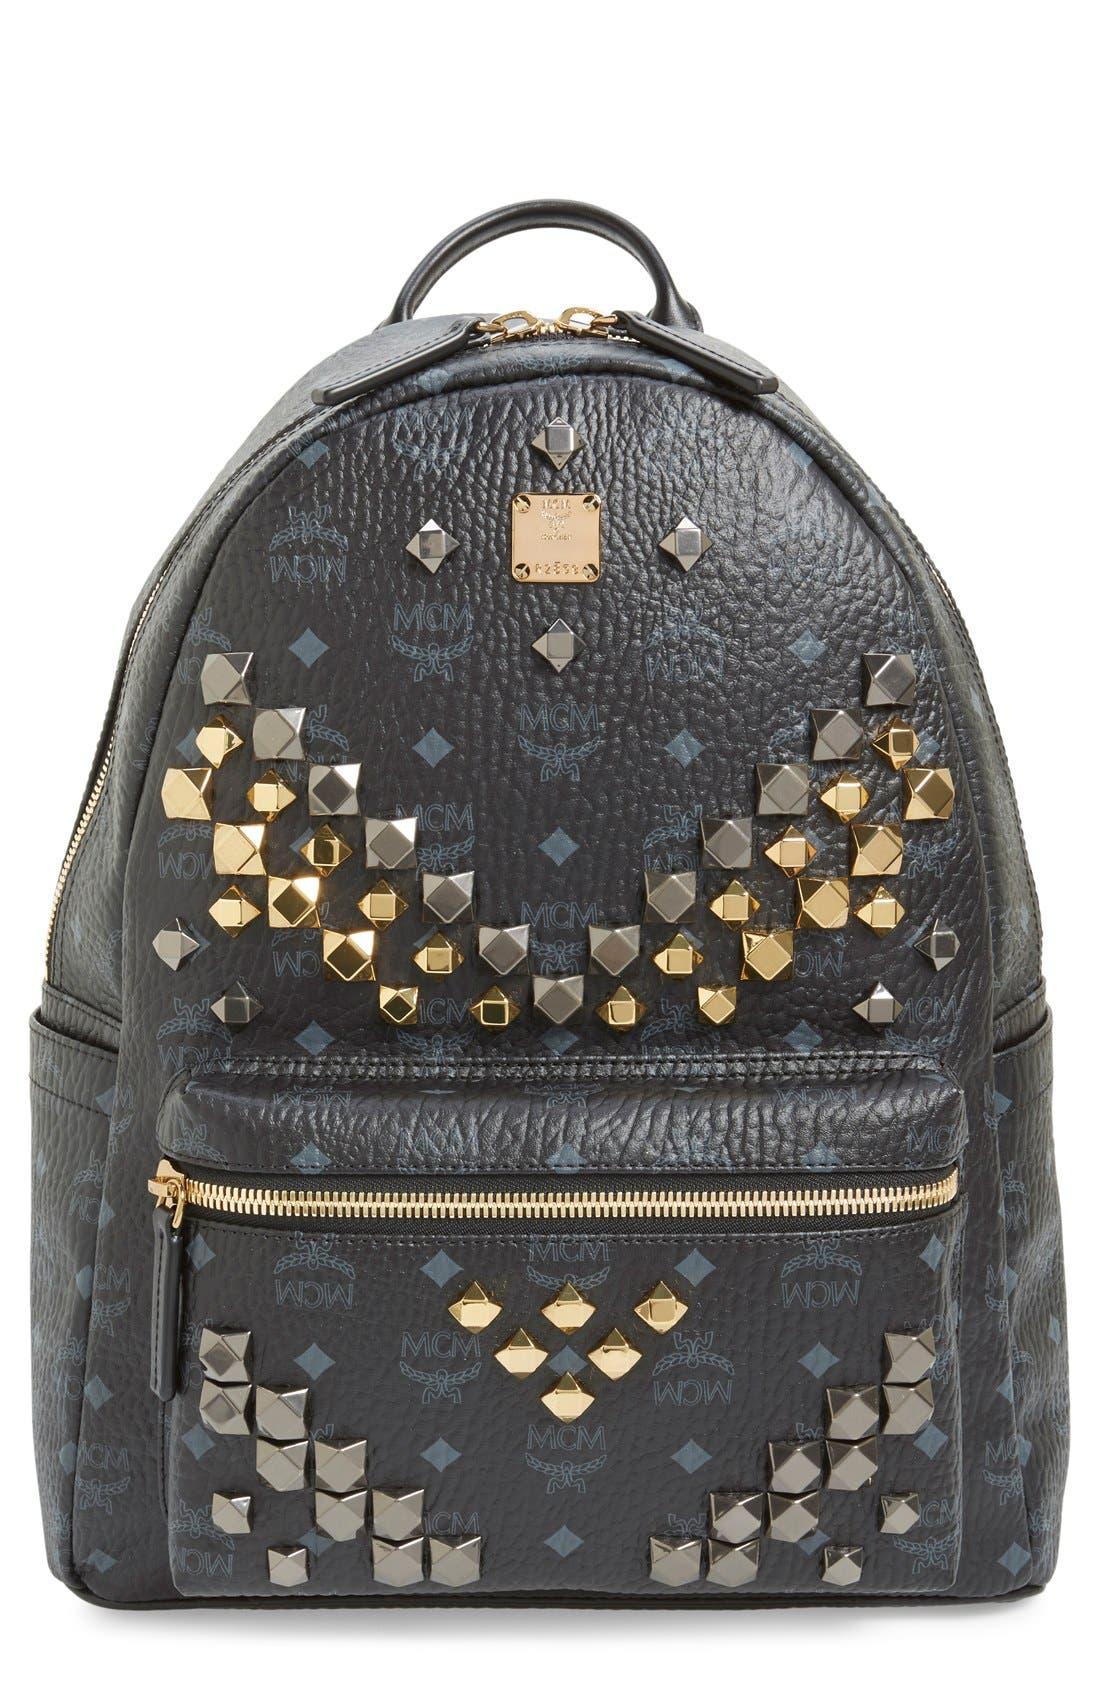 Main Image - MCM 'Medium Stark - Visetos' Studded Backpack